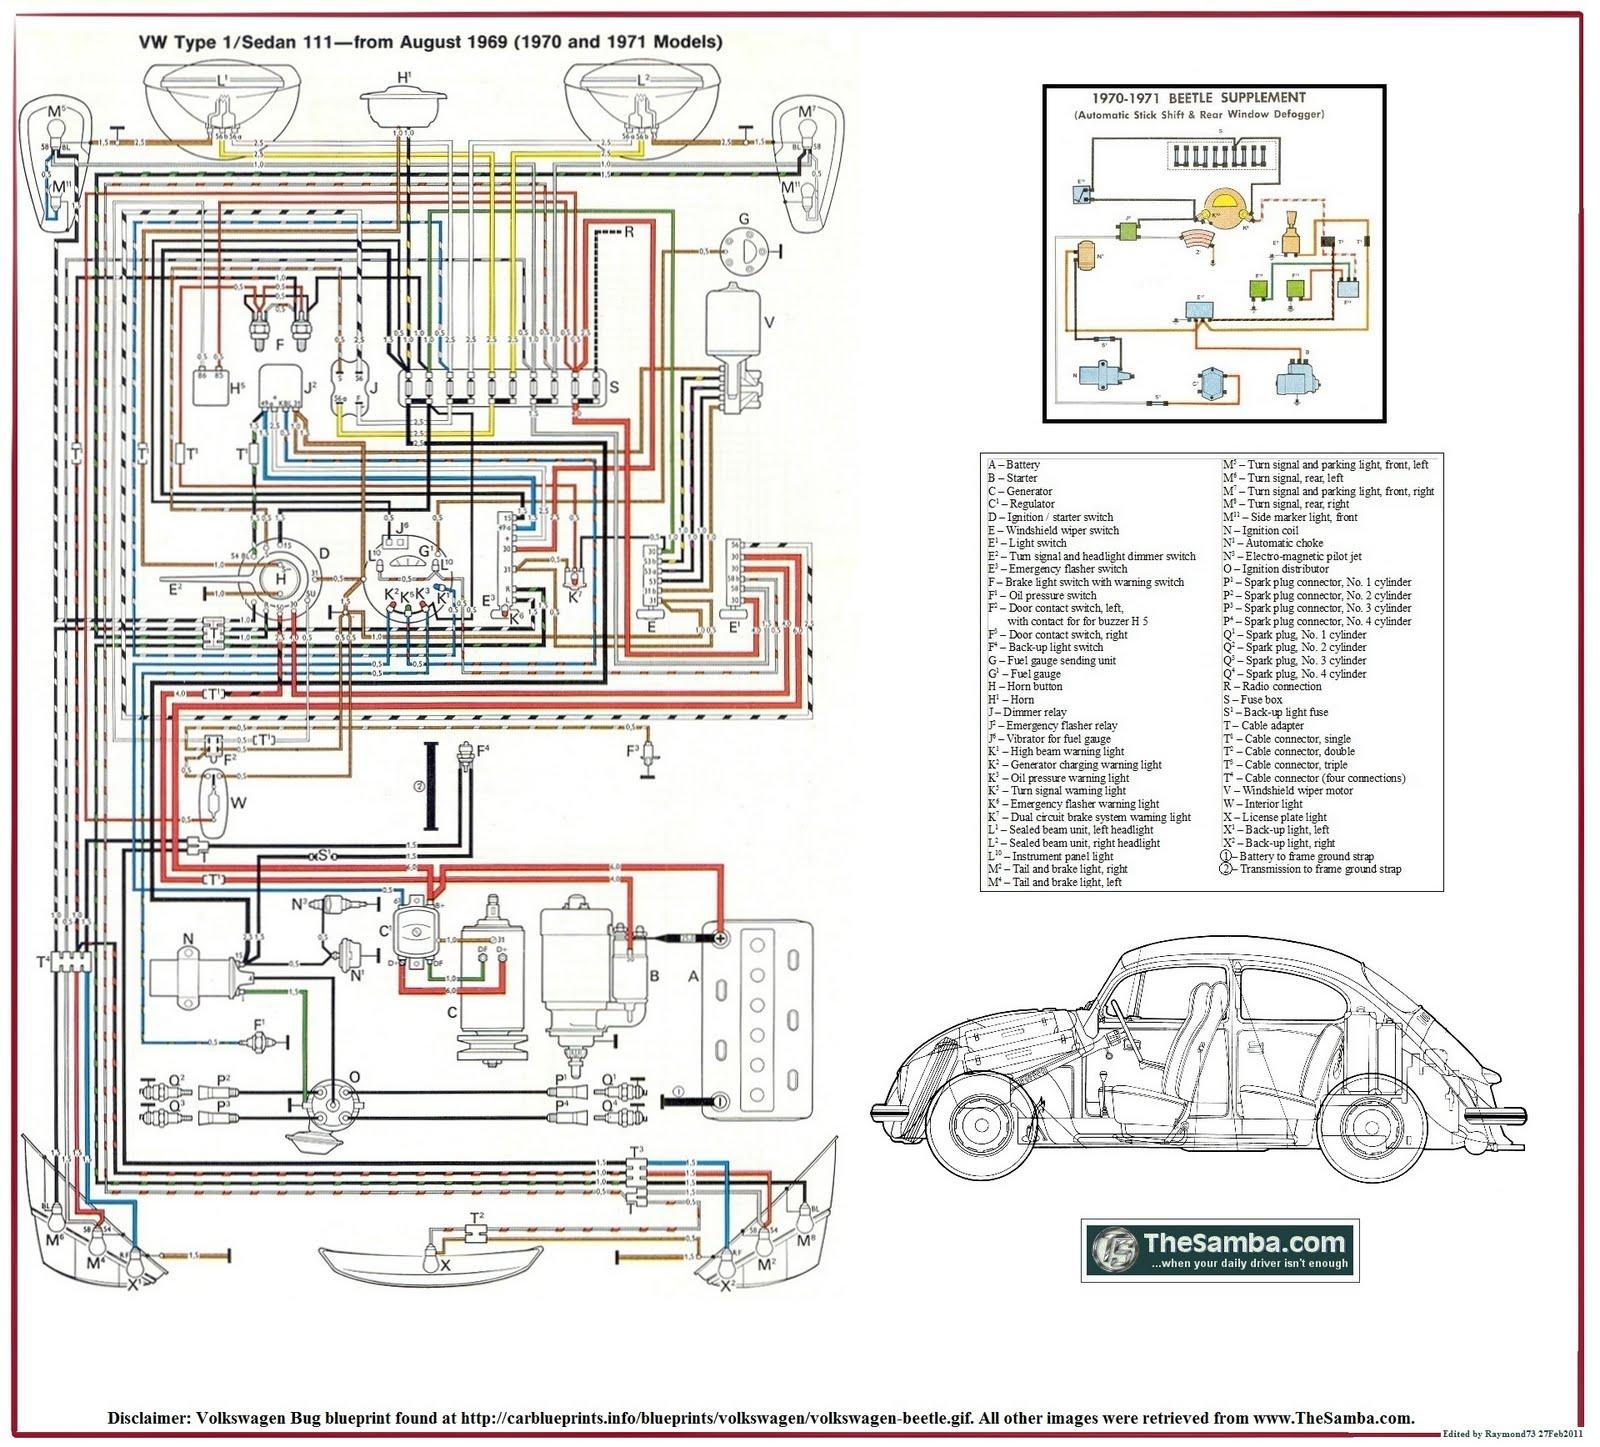 vw bug engine tin diagram standard electrical wiring diagram